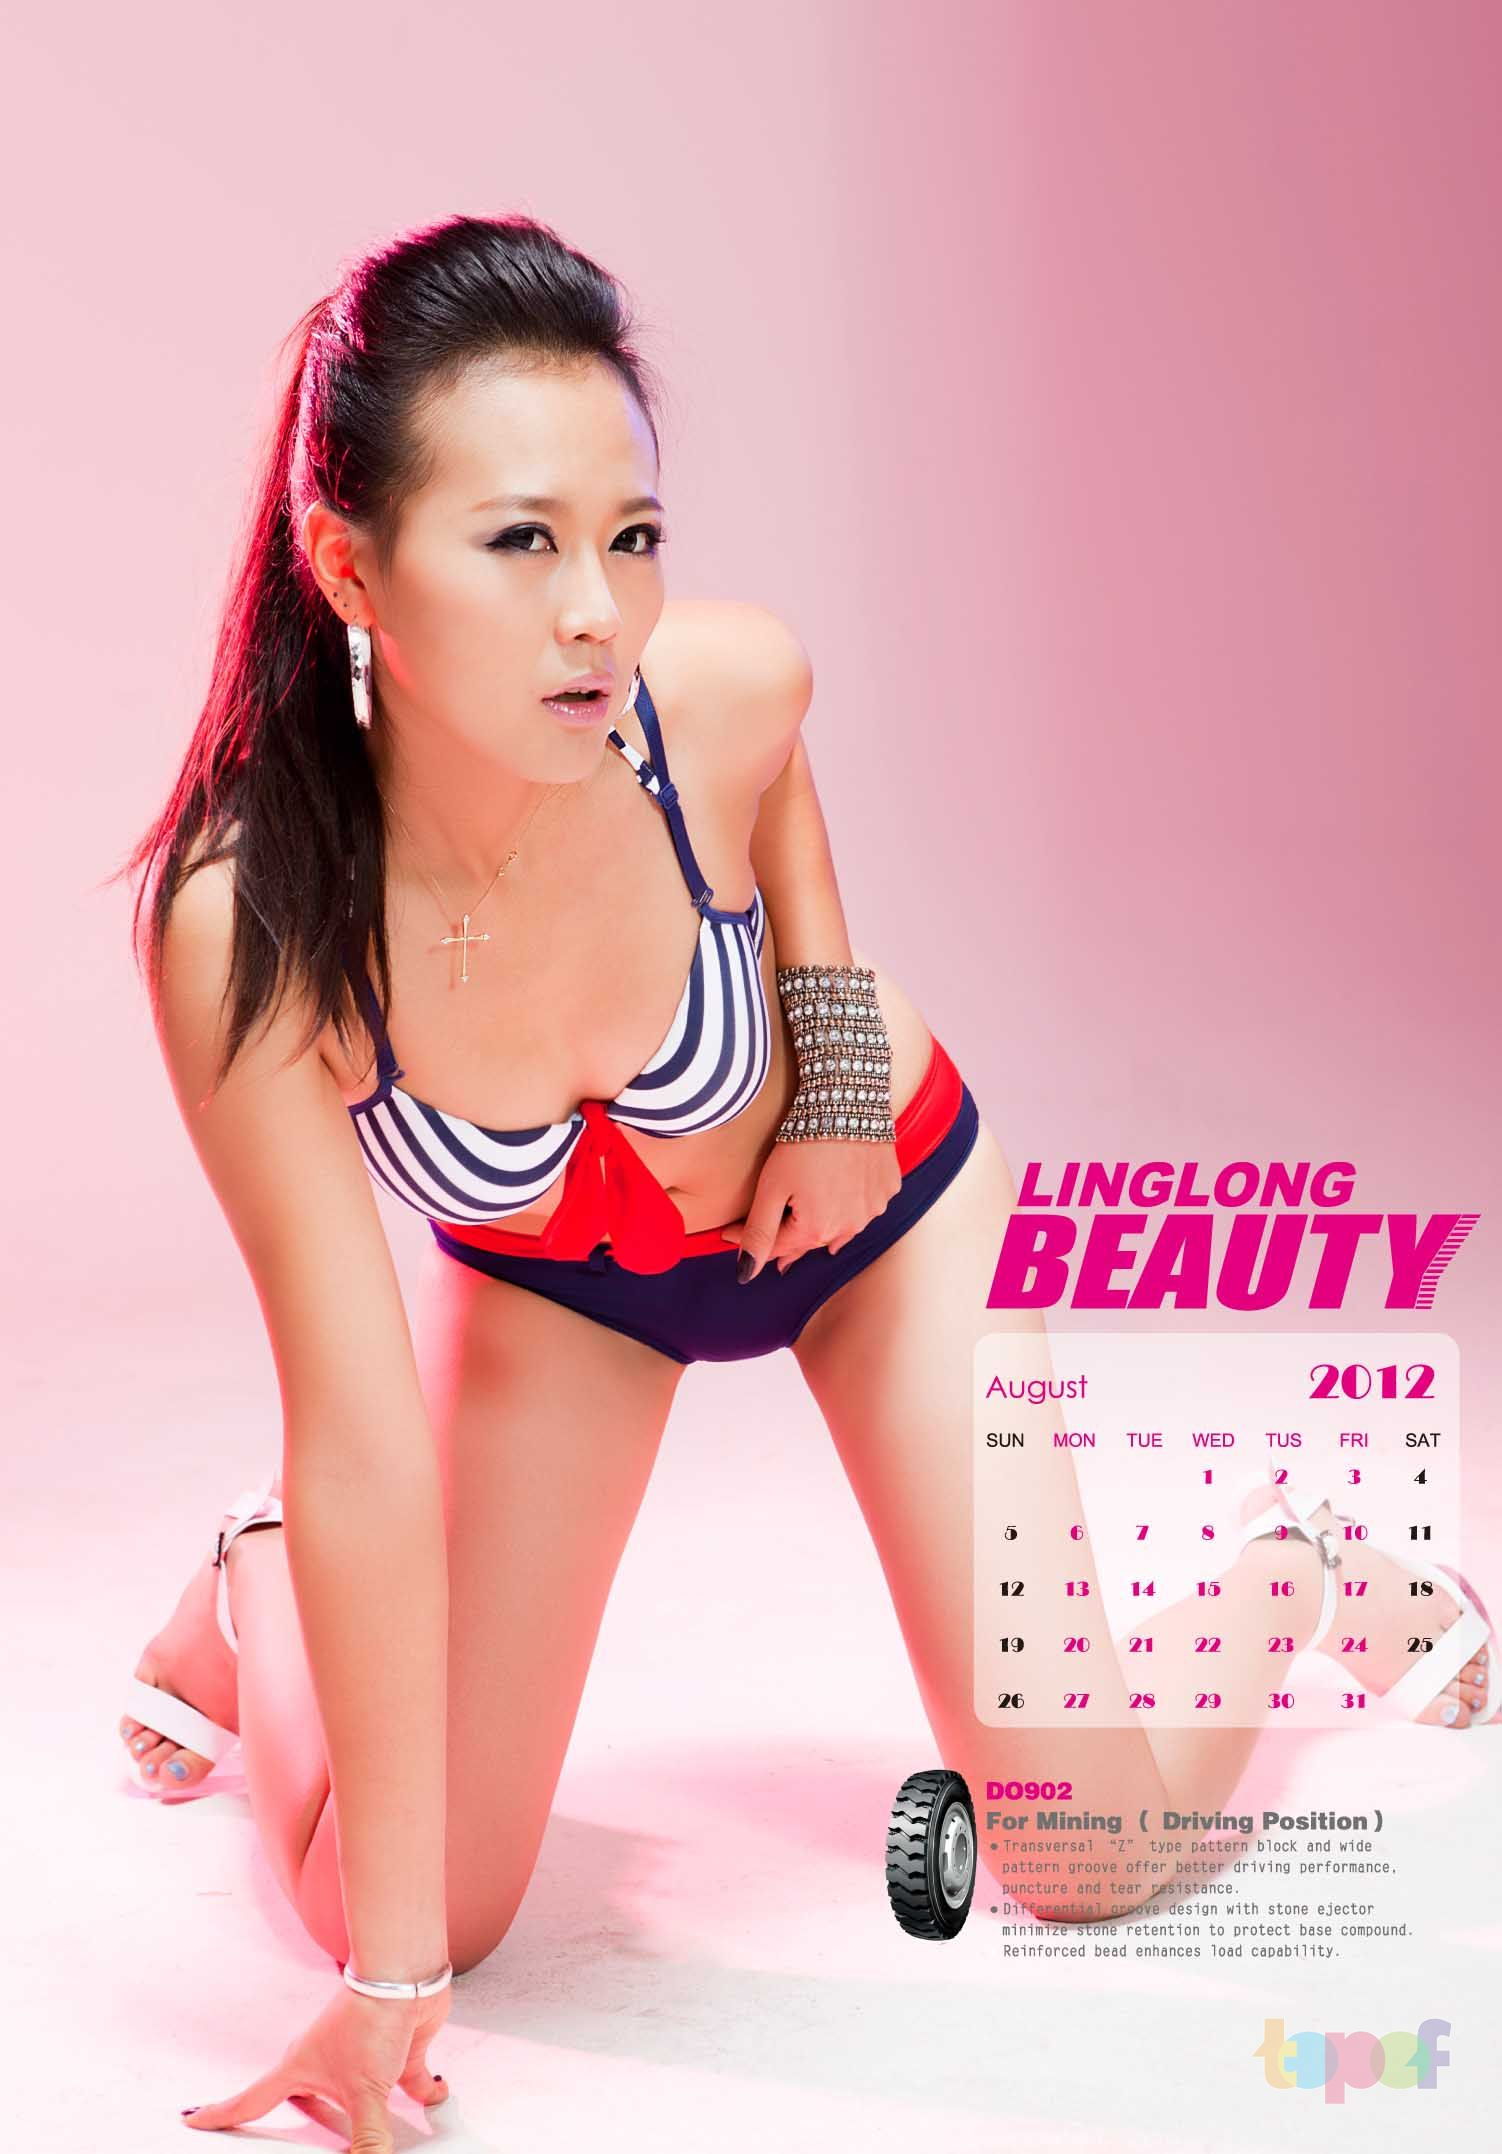 Календари от LingLong (Шины). Август 2012 года